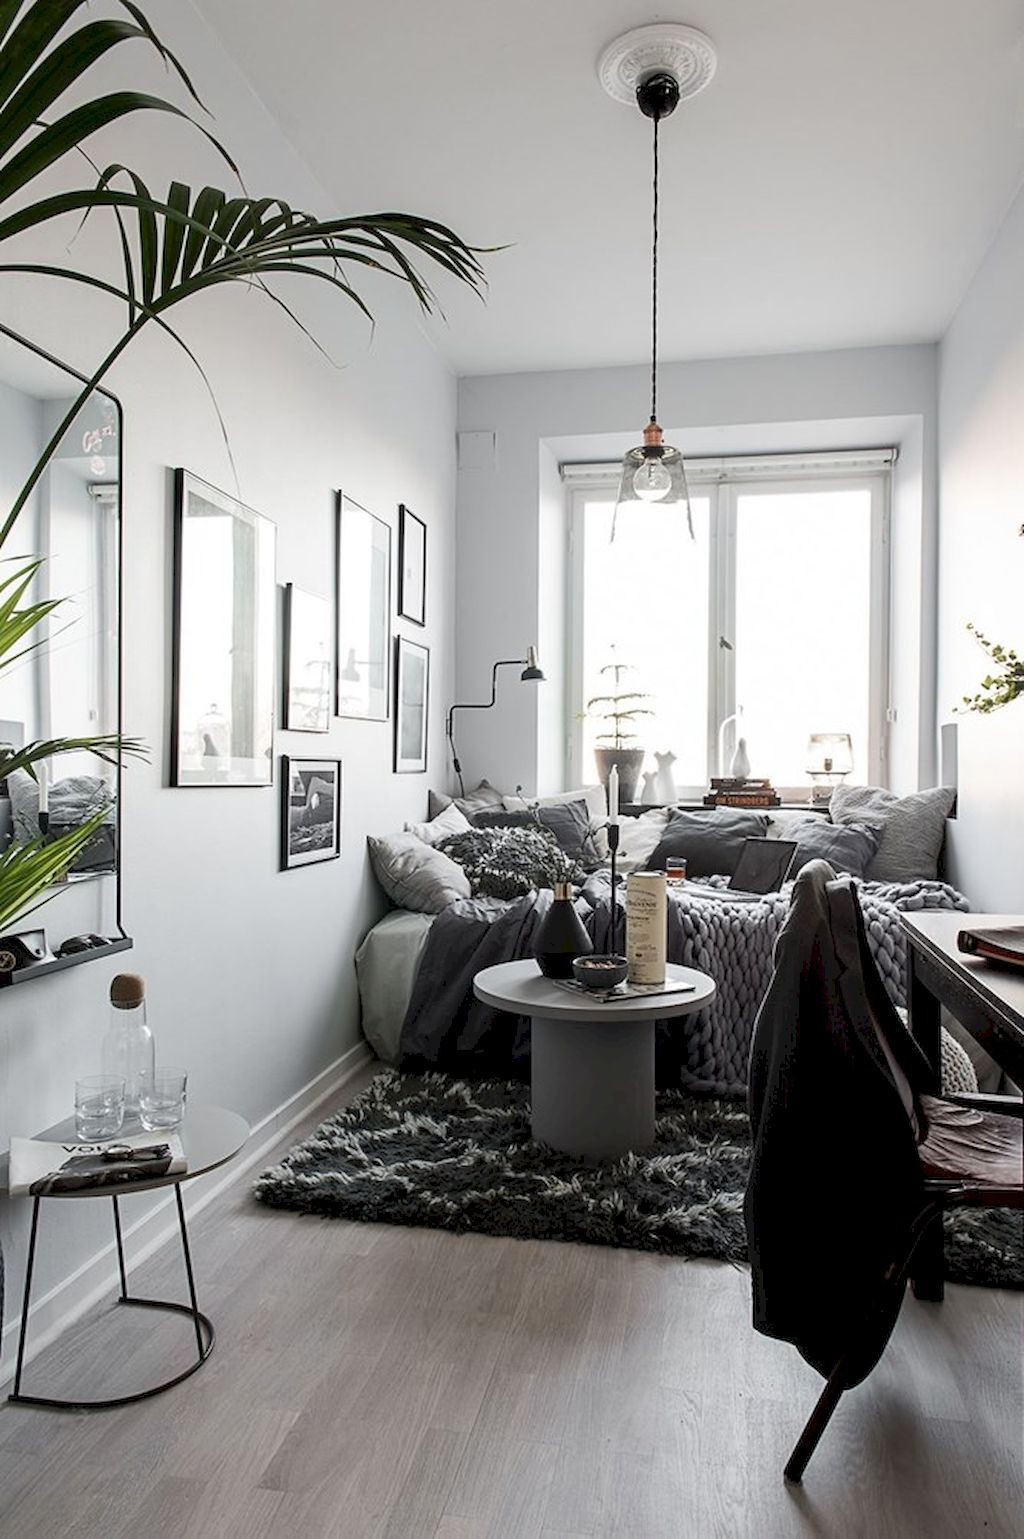 Cozy Apartment Studio Decorating Ideas 72 Tiny Studio